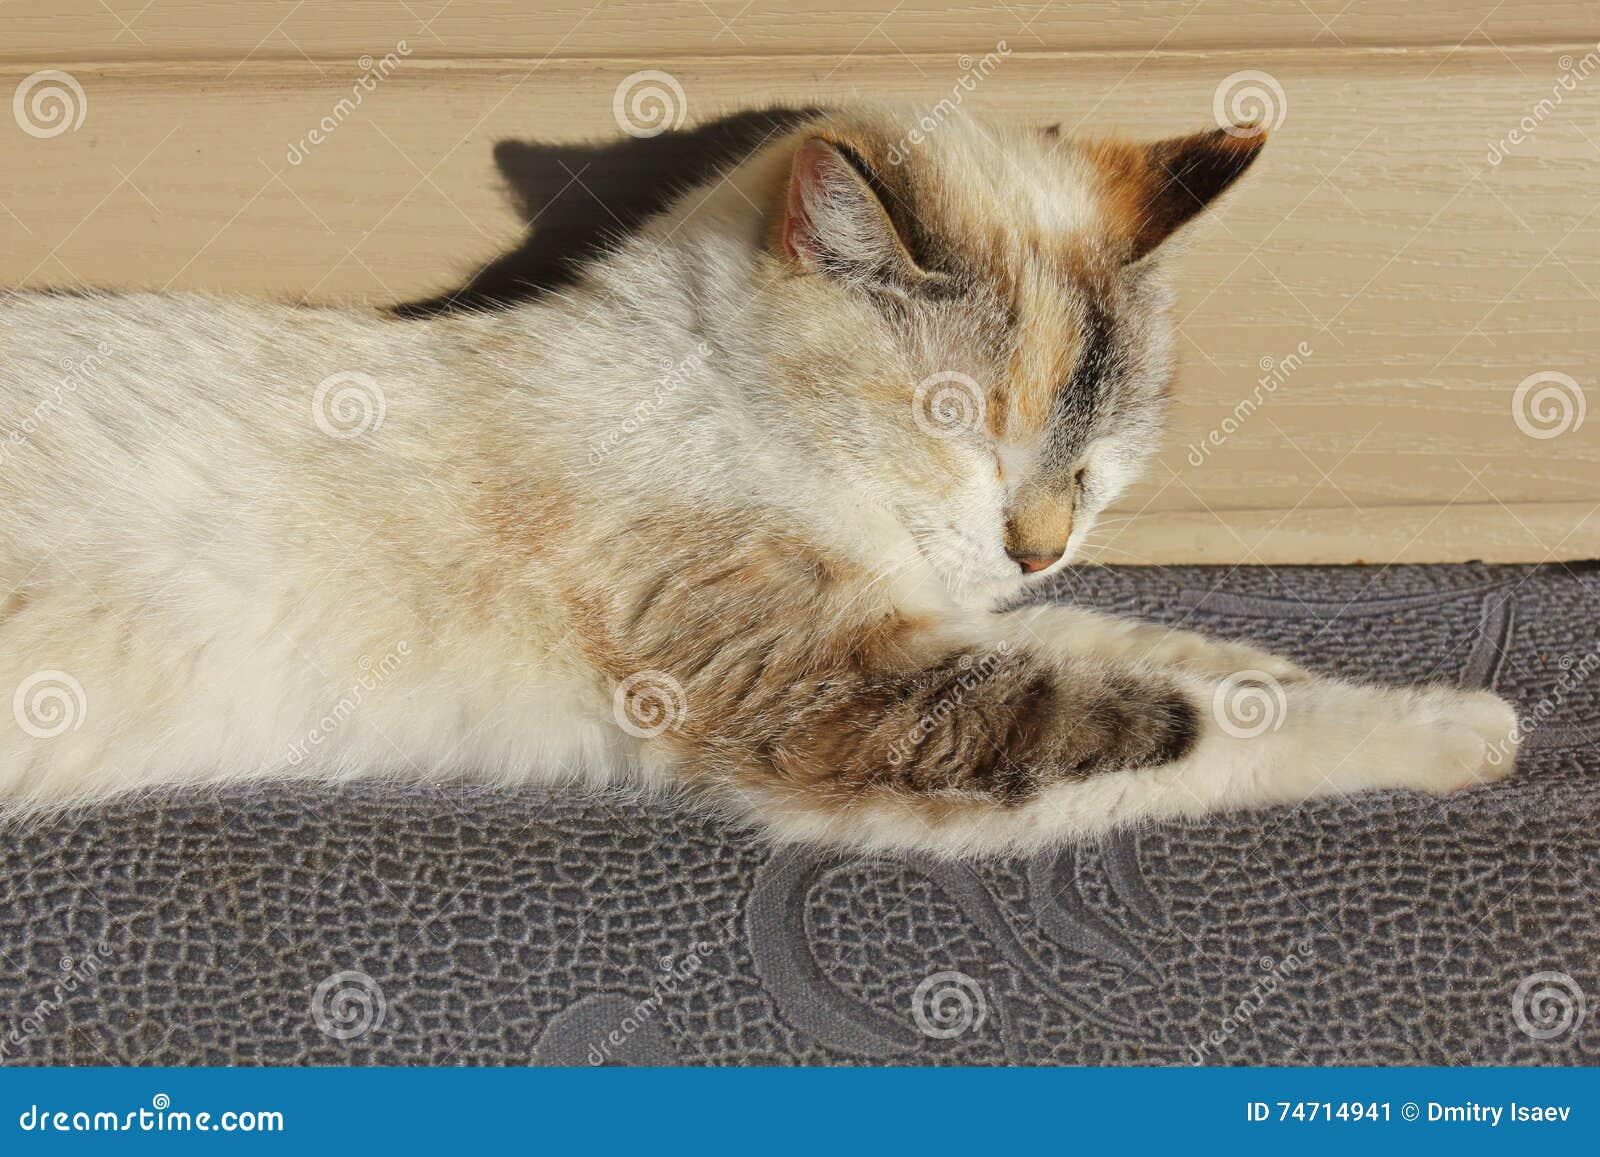 Siamese cat basking in the sun